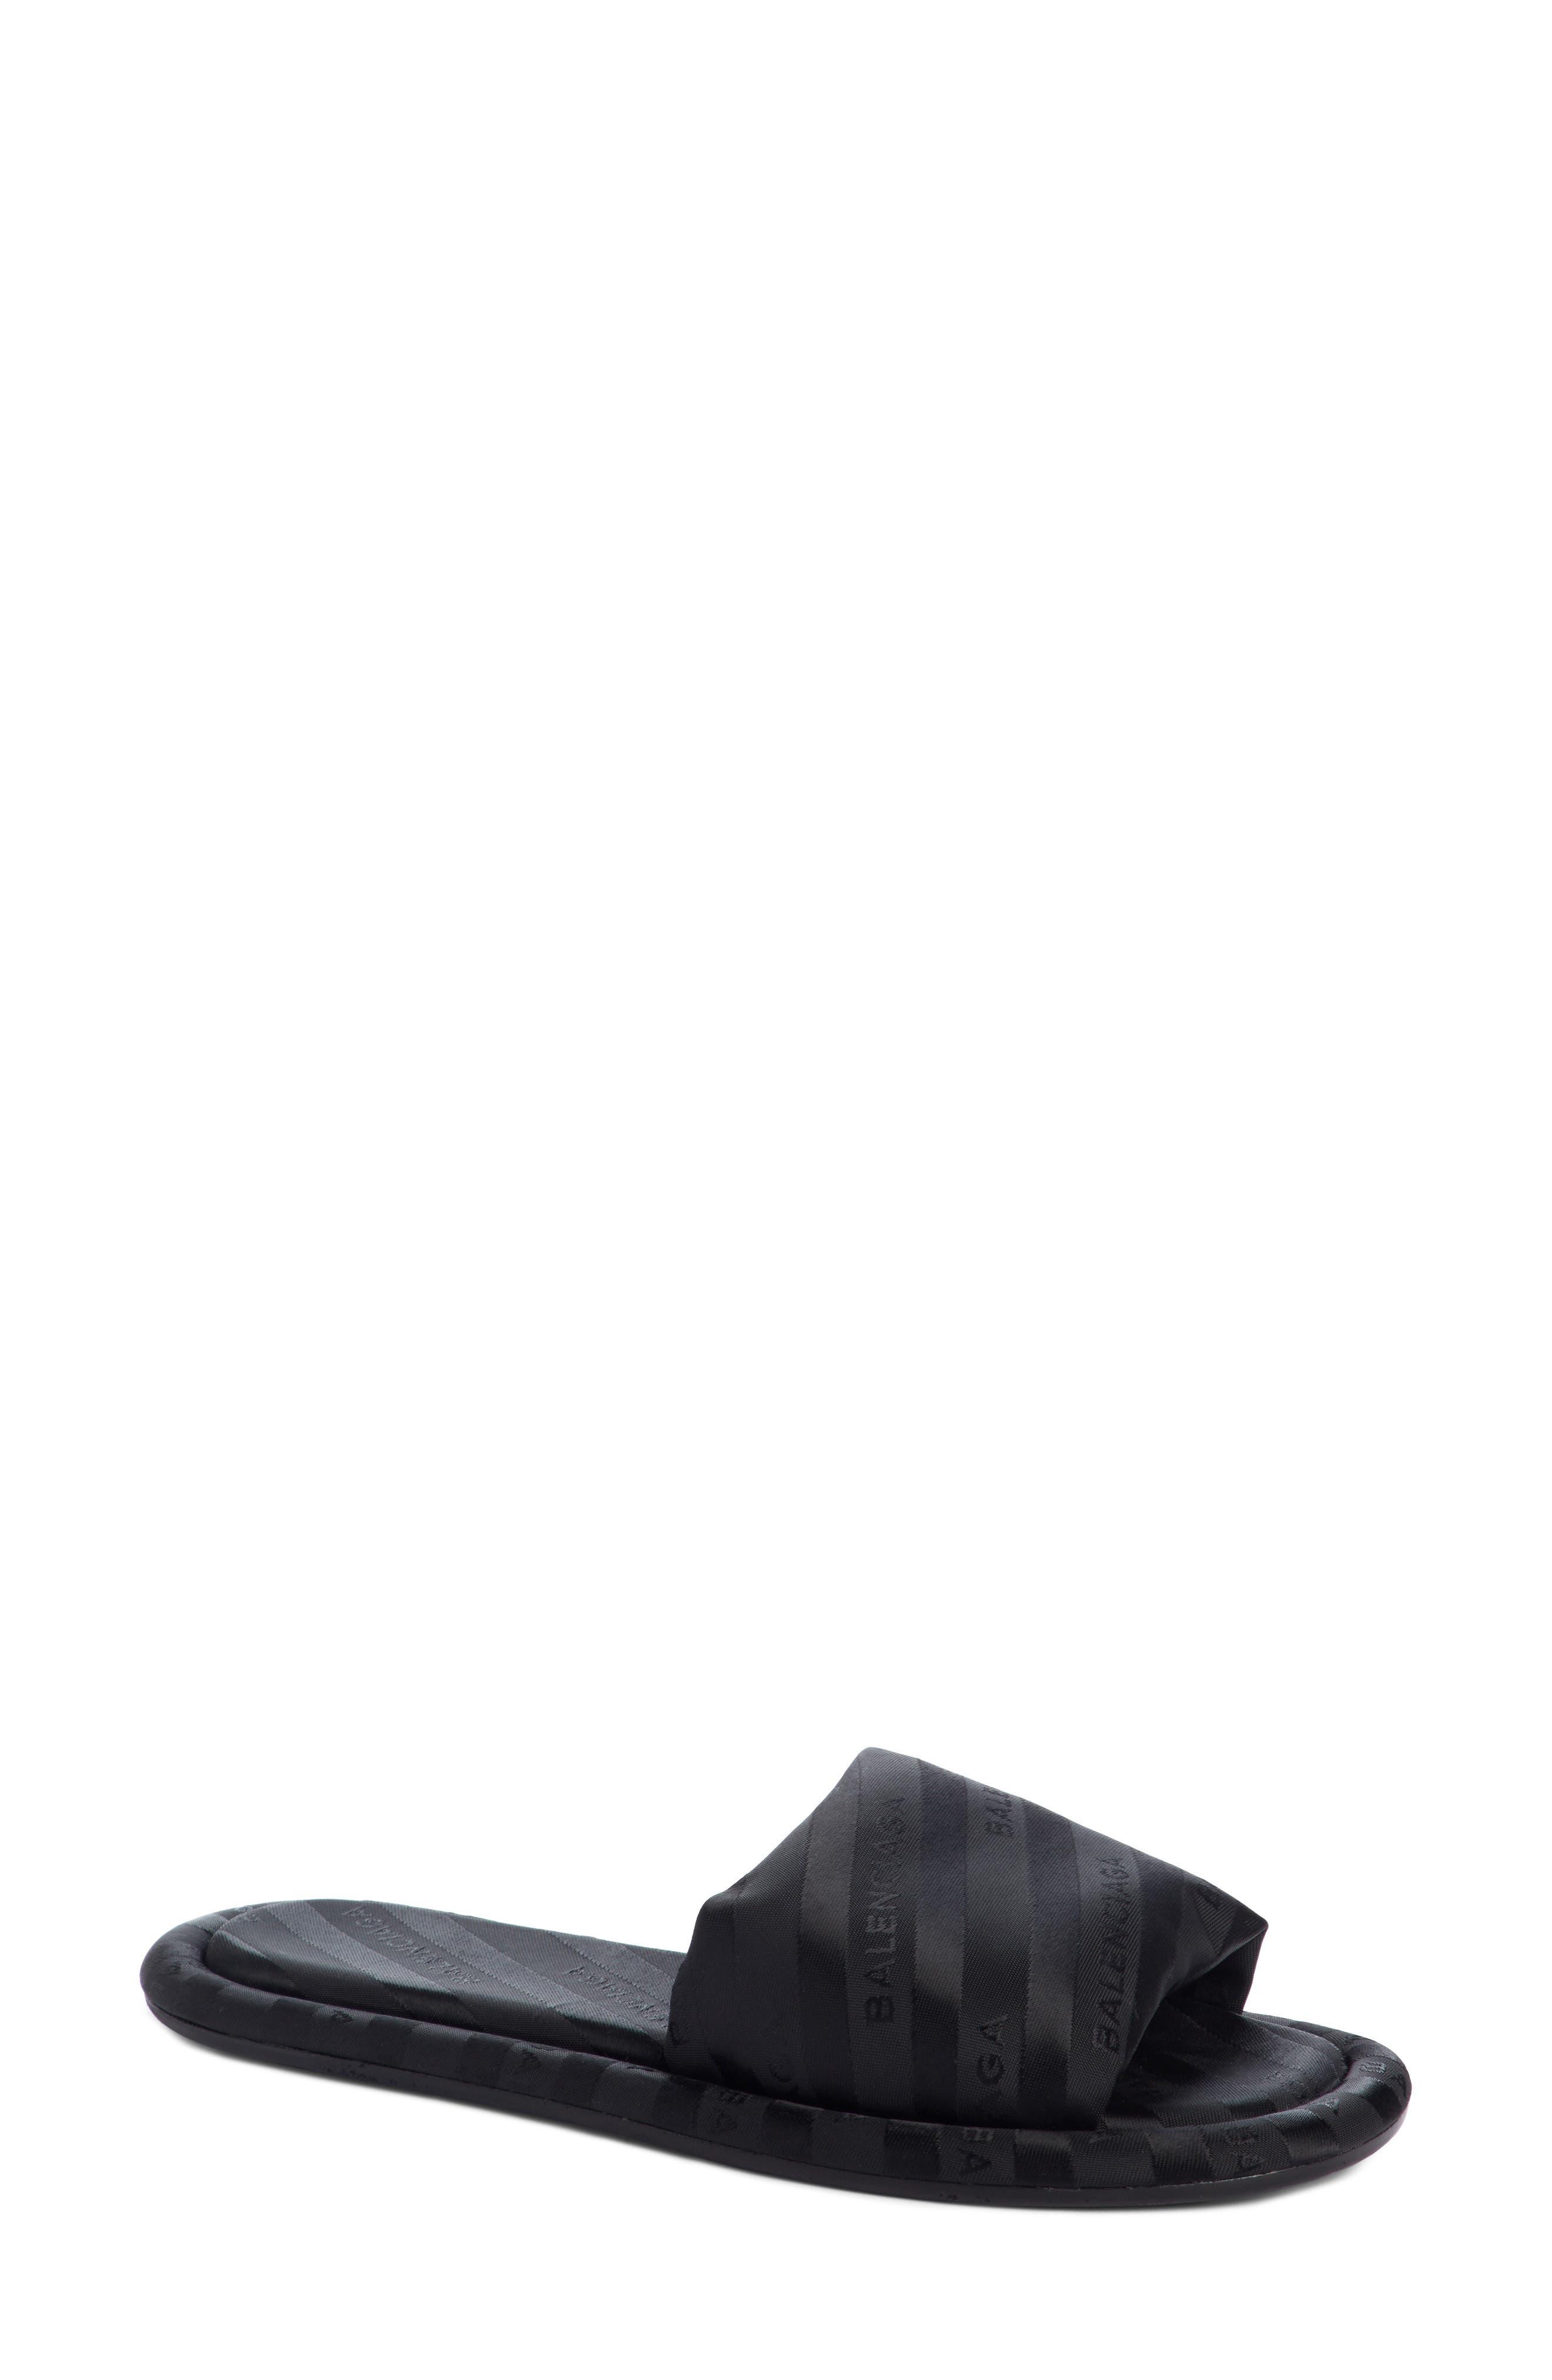 Stripe Slide Sandal,                             Main thumbnail 1, color,                             001